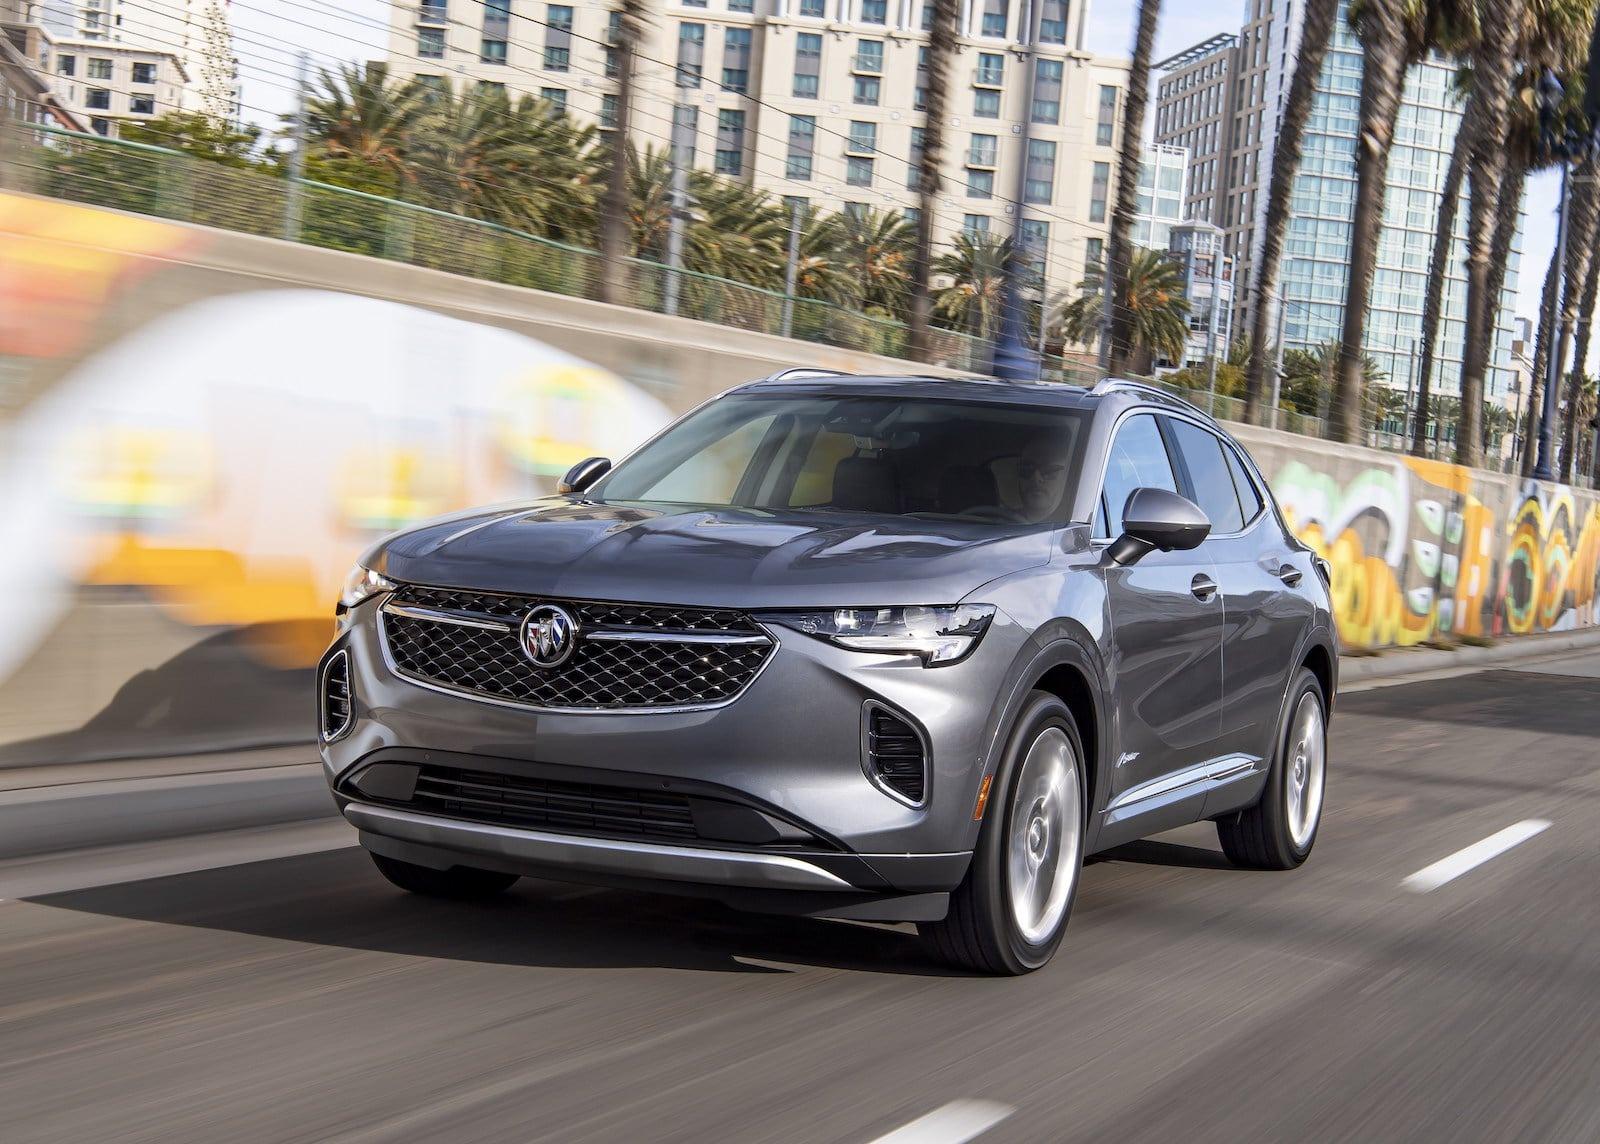 2022 Buick Envision Interior